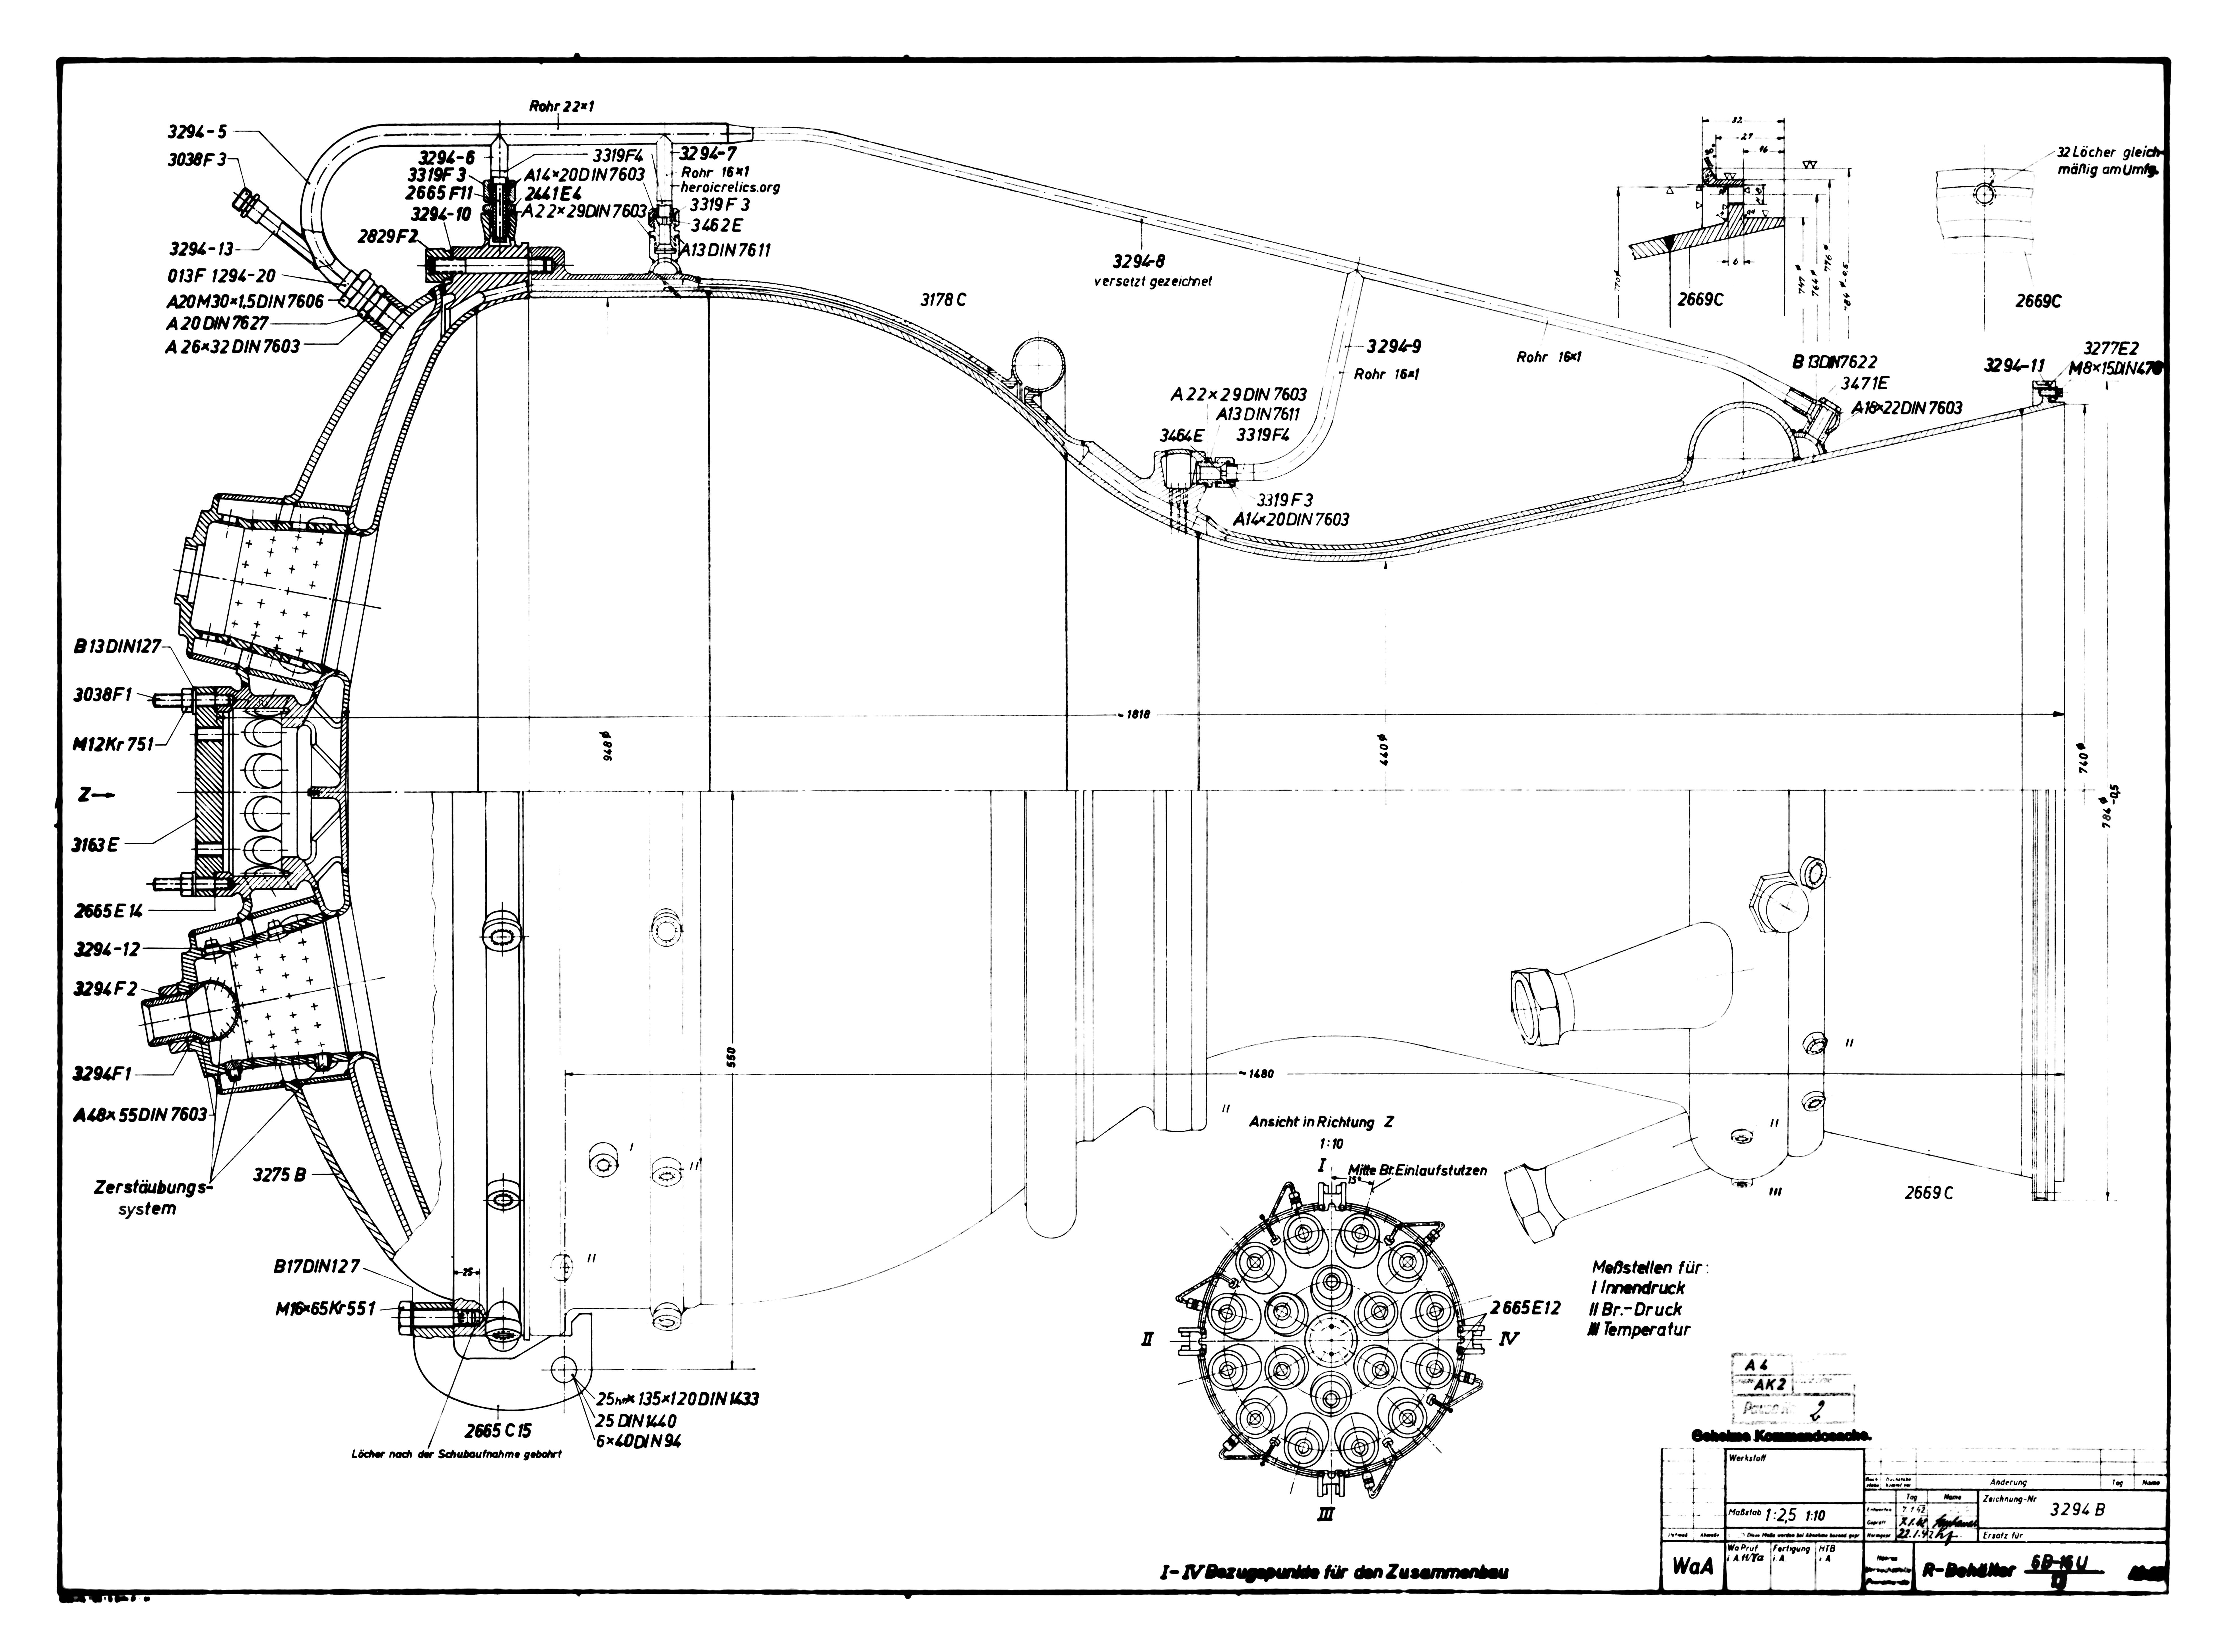 2004 chevy trailblazer engine diagram holden rodeo stereo wiring power steering 4 2 html